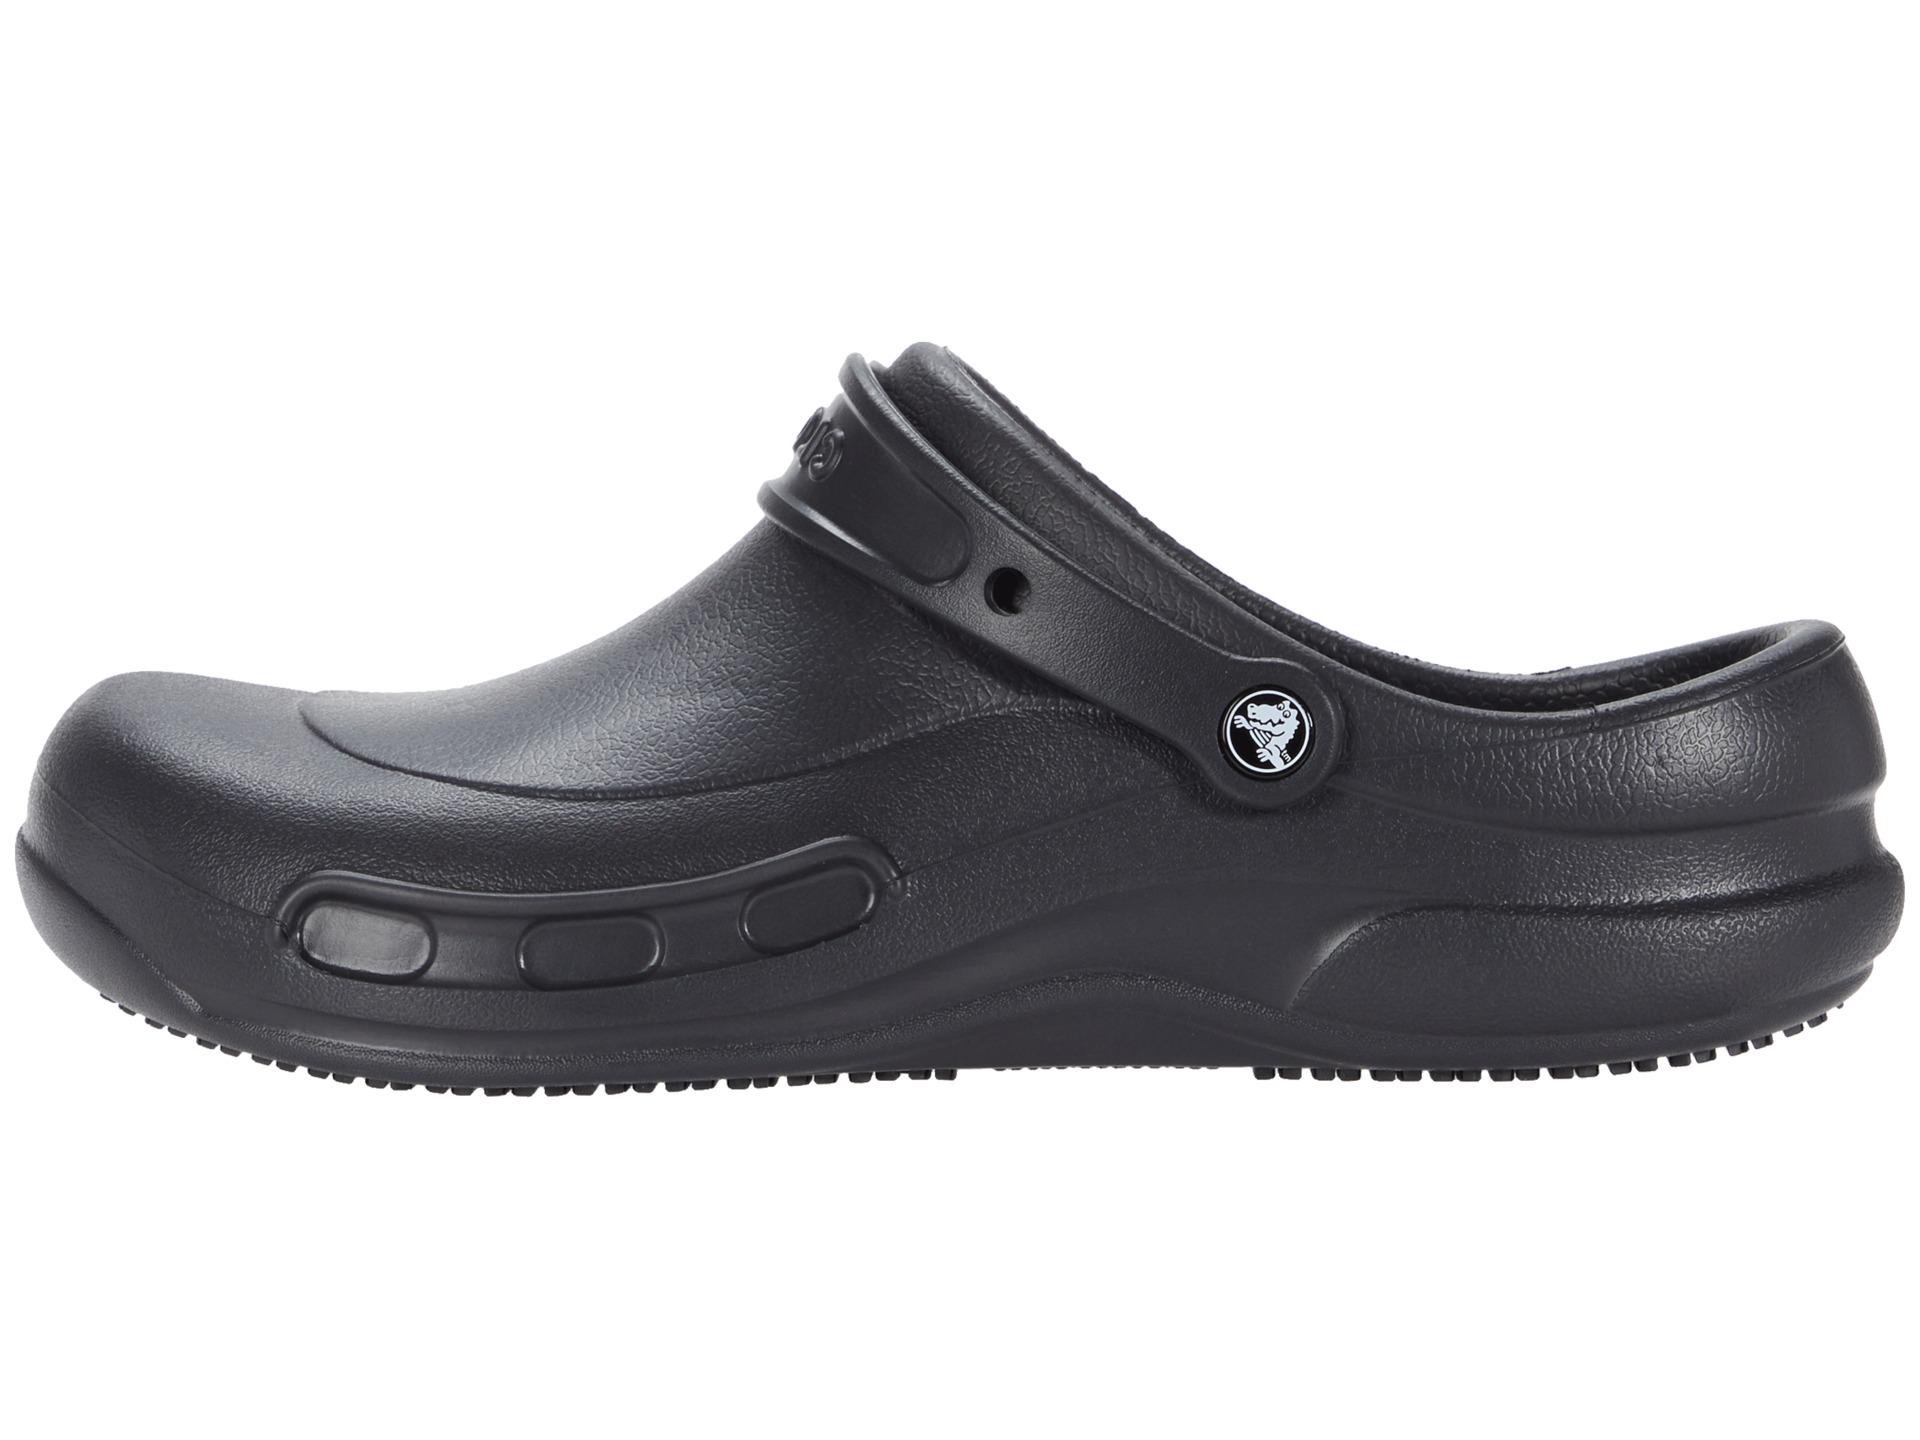 Crocs bistro unisex black free shipping for Cuisine 0 crocs